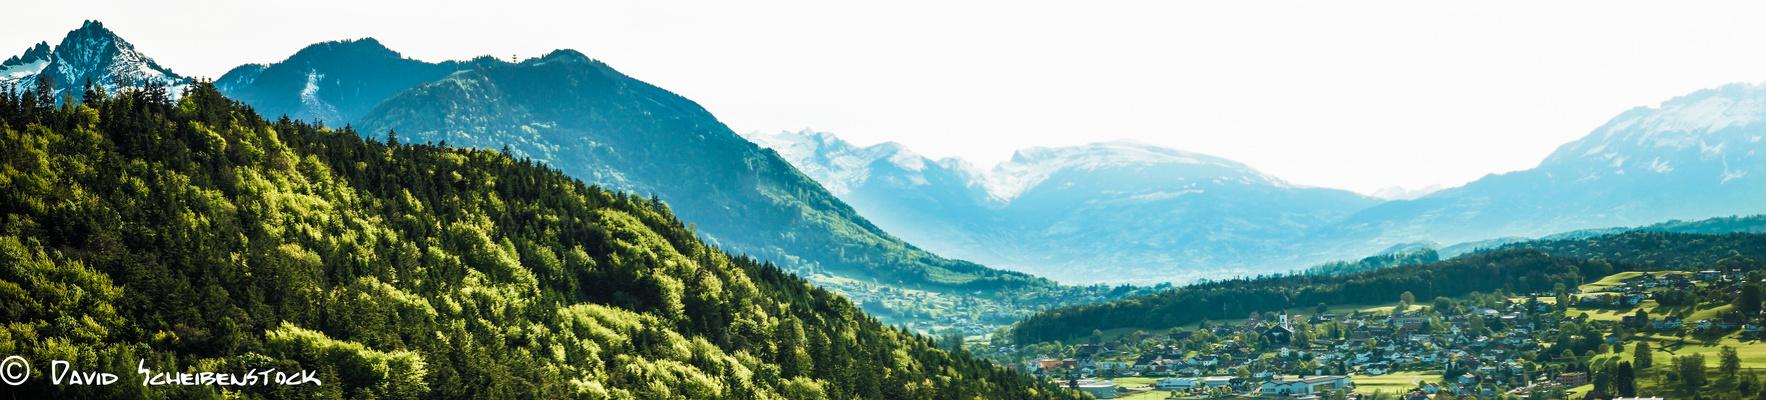 vorarlberg berg berg